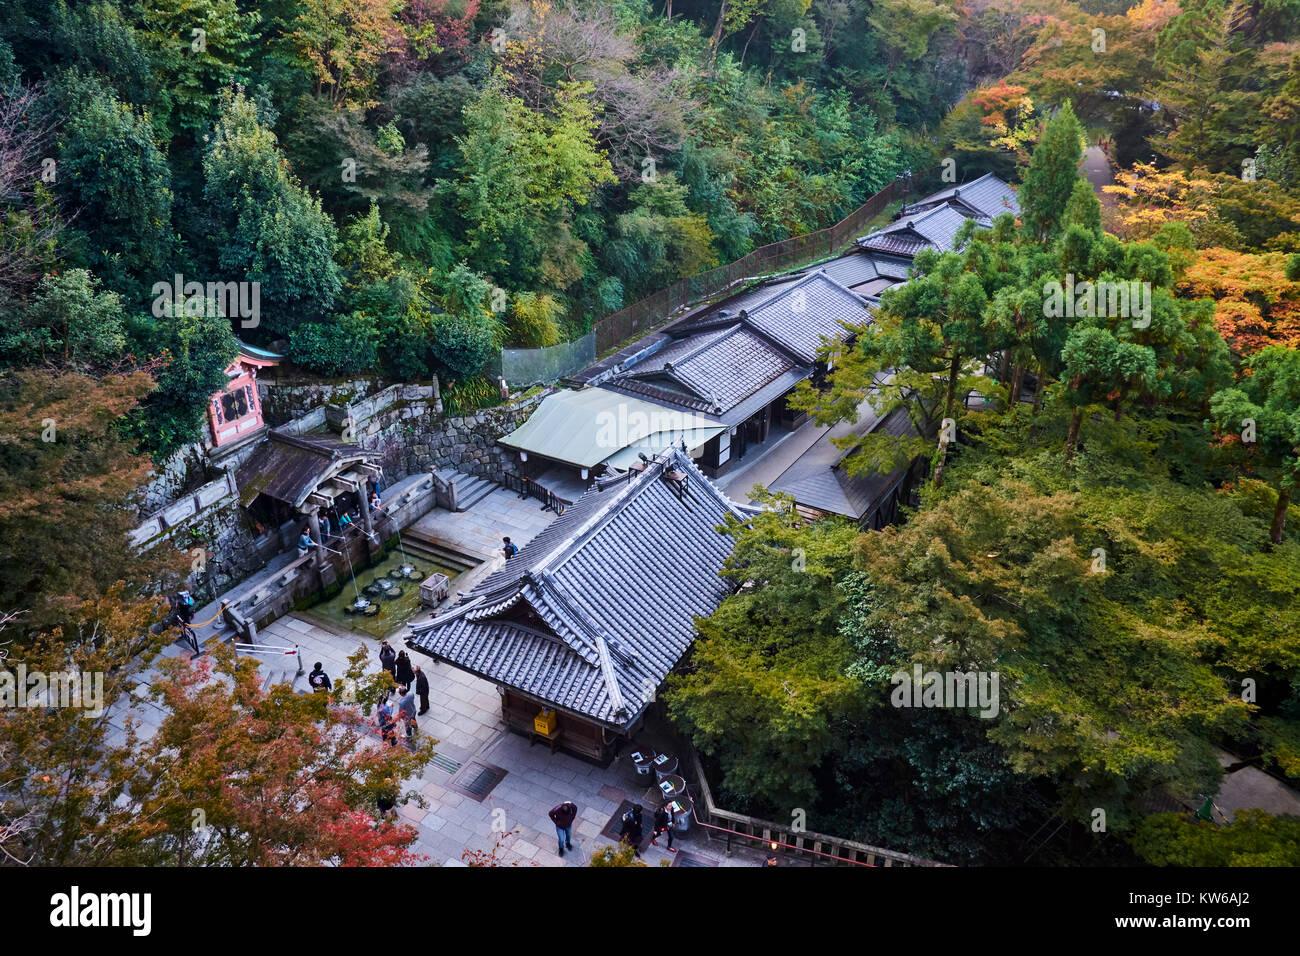 Japan, Honshu Island, Region Kansai, Kyoto, Kiyomizu-dera Tempel, UNESCO Weltkulturerbe Stockfoto